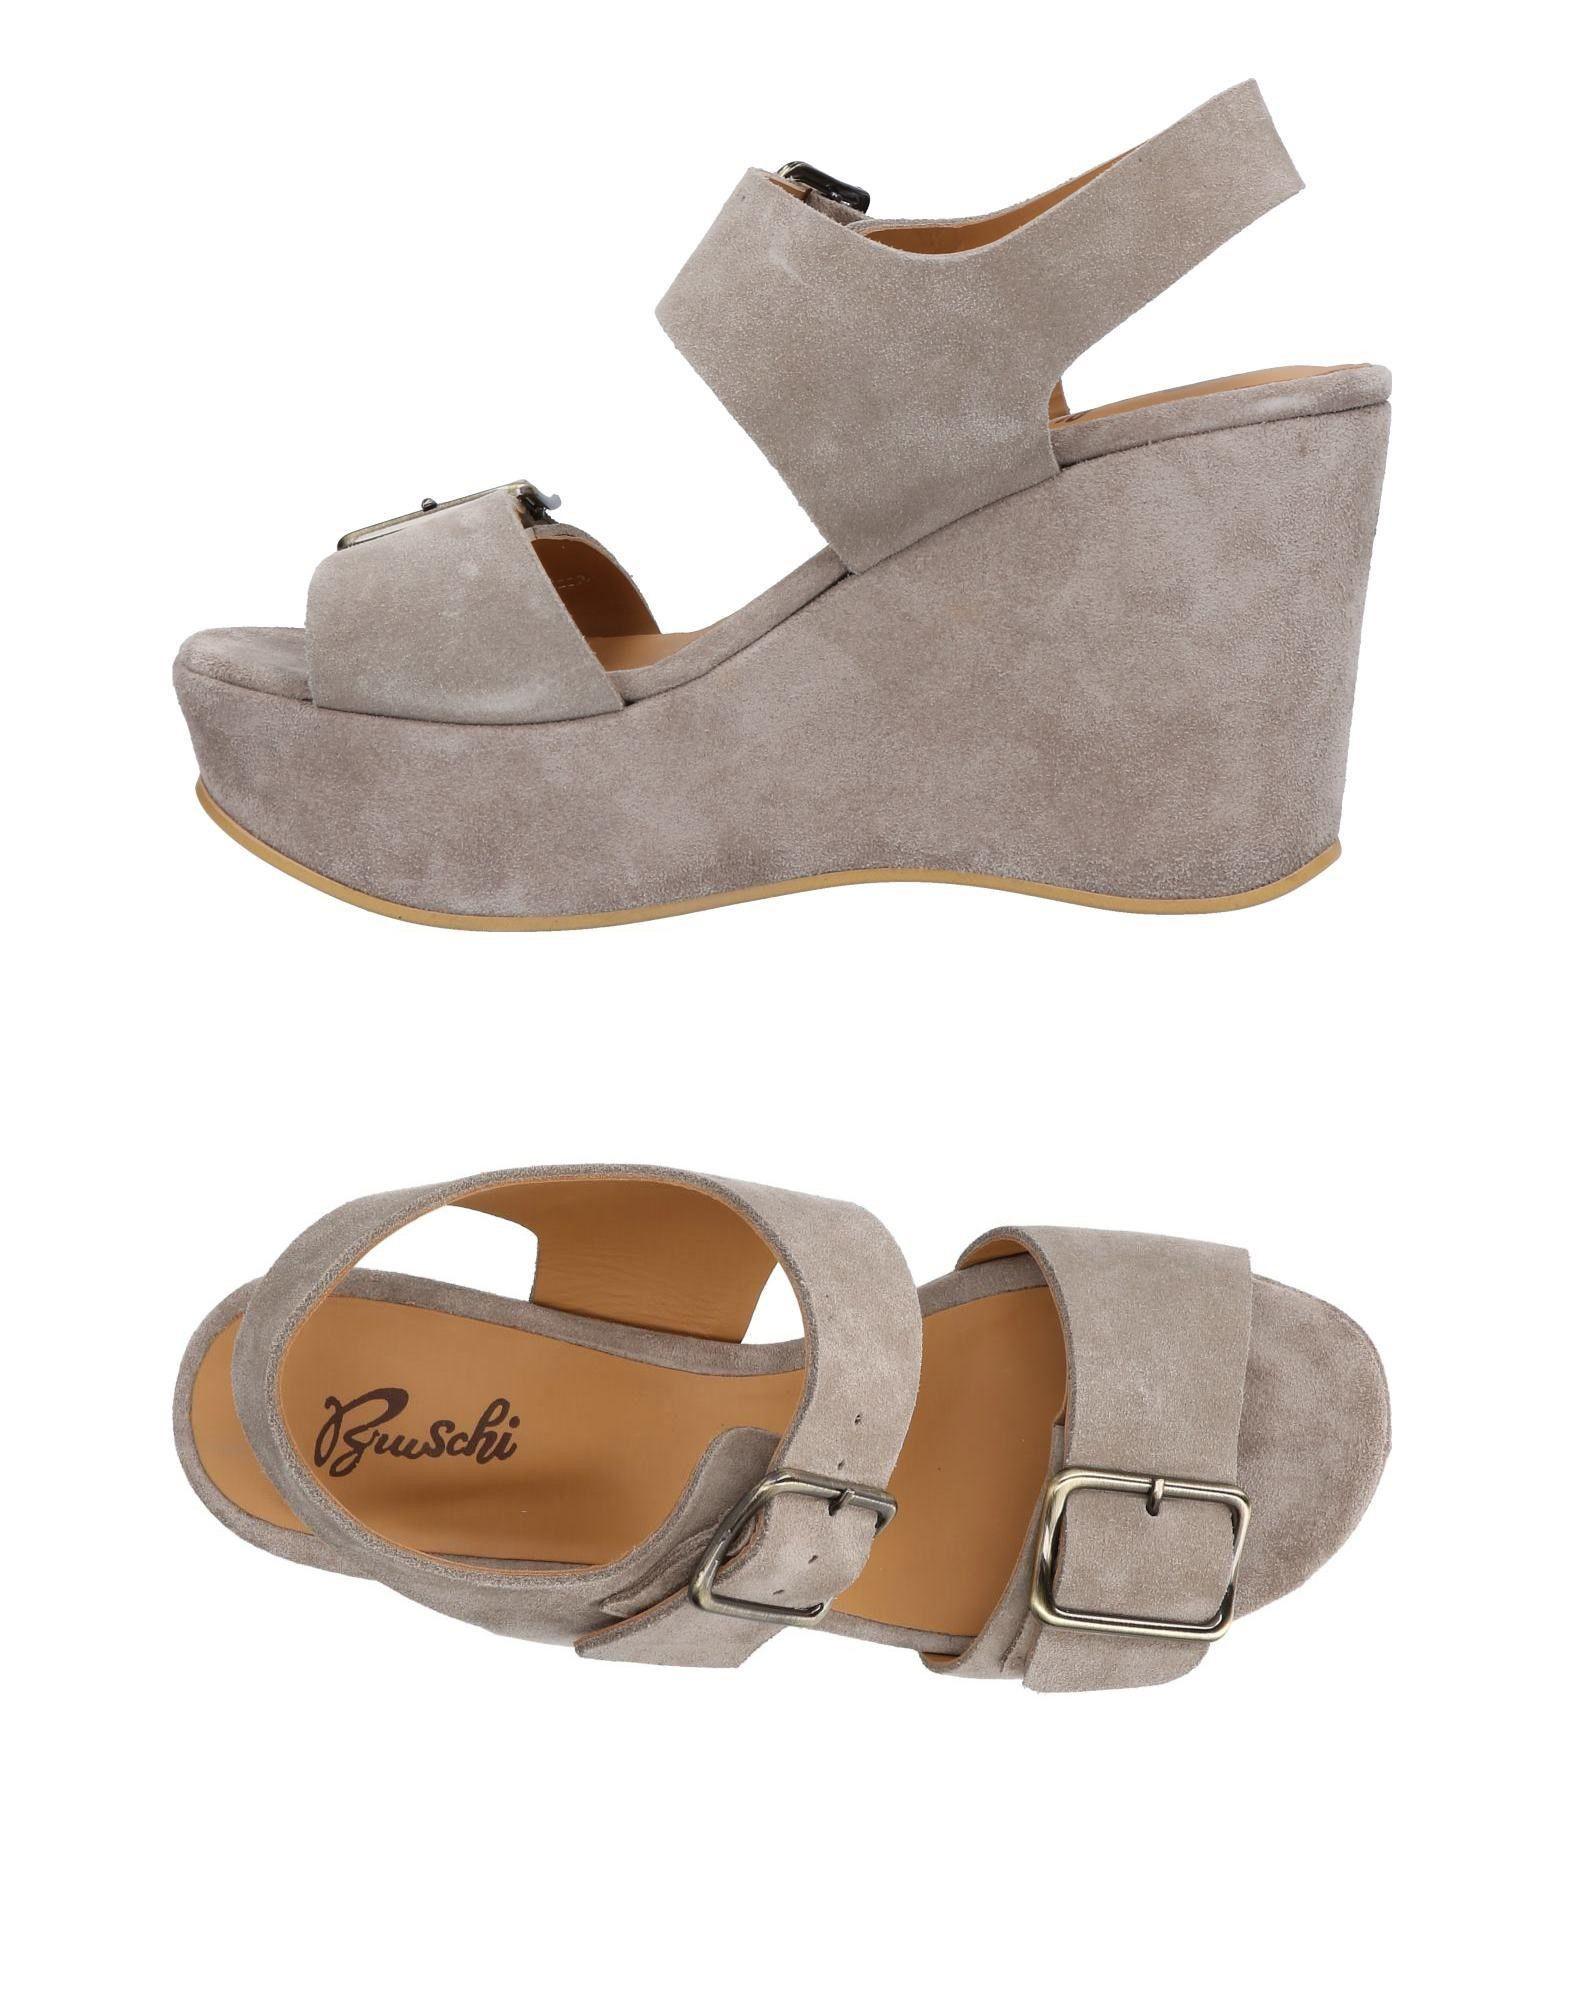 Bruschi Sandalen Damen  11464283NT Gute Qualität beliebte Schuhe